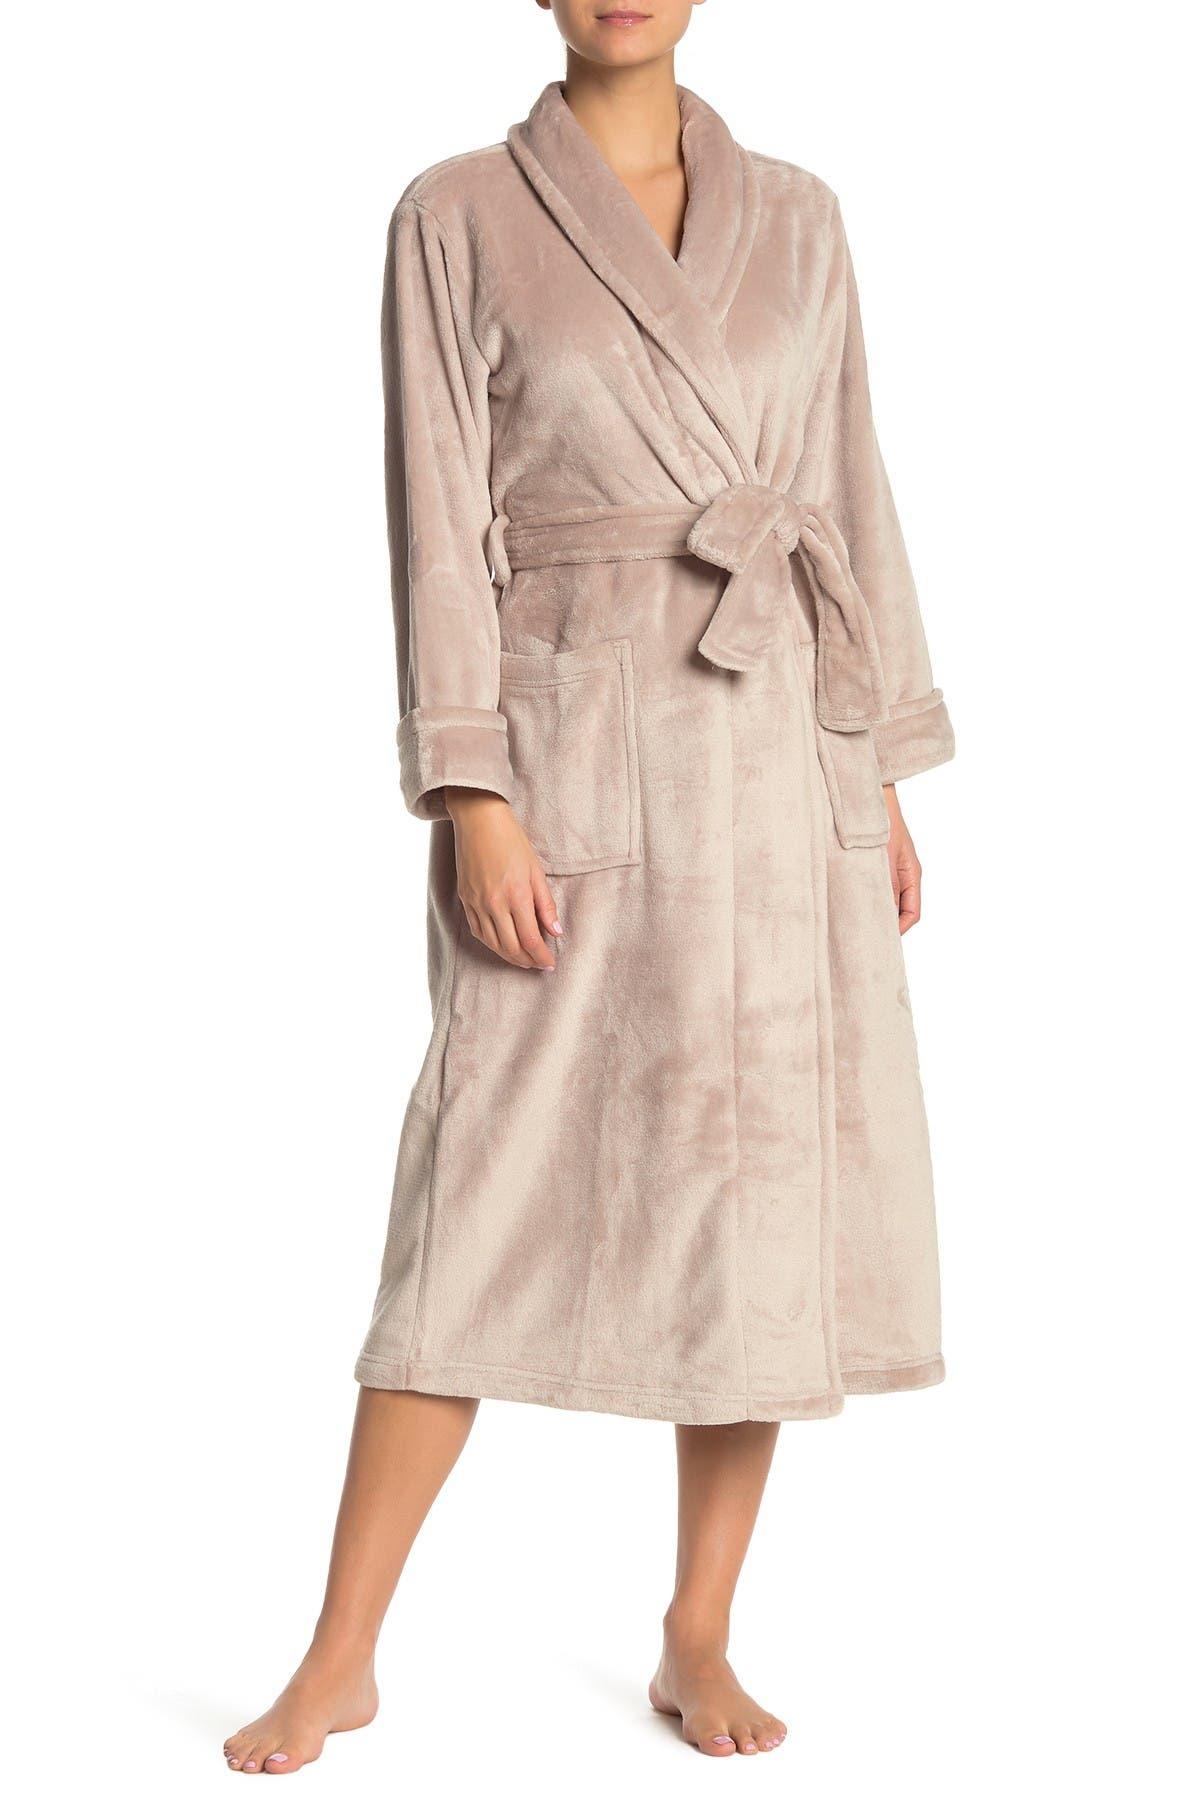 Image of N Natori Plush Fleece Shawl Collar Robe